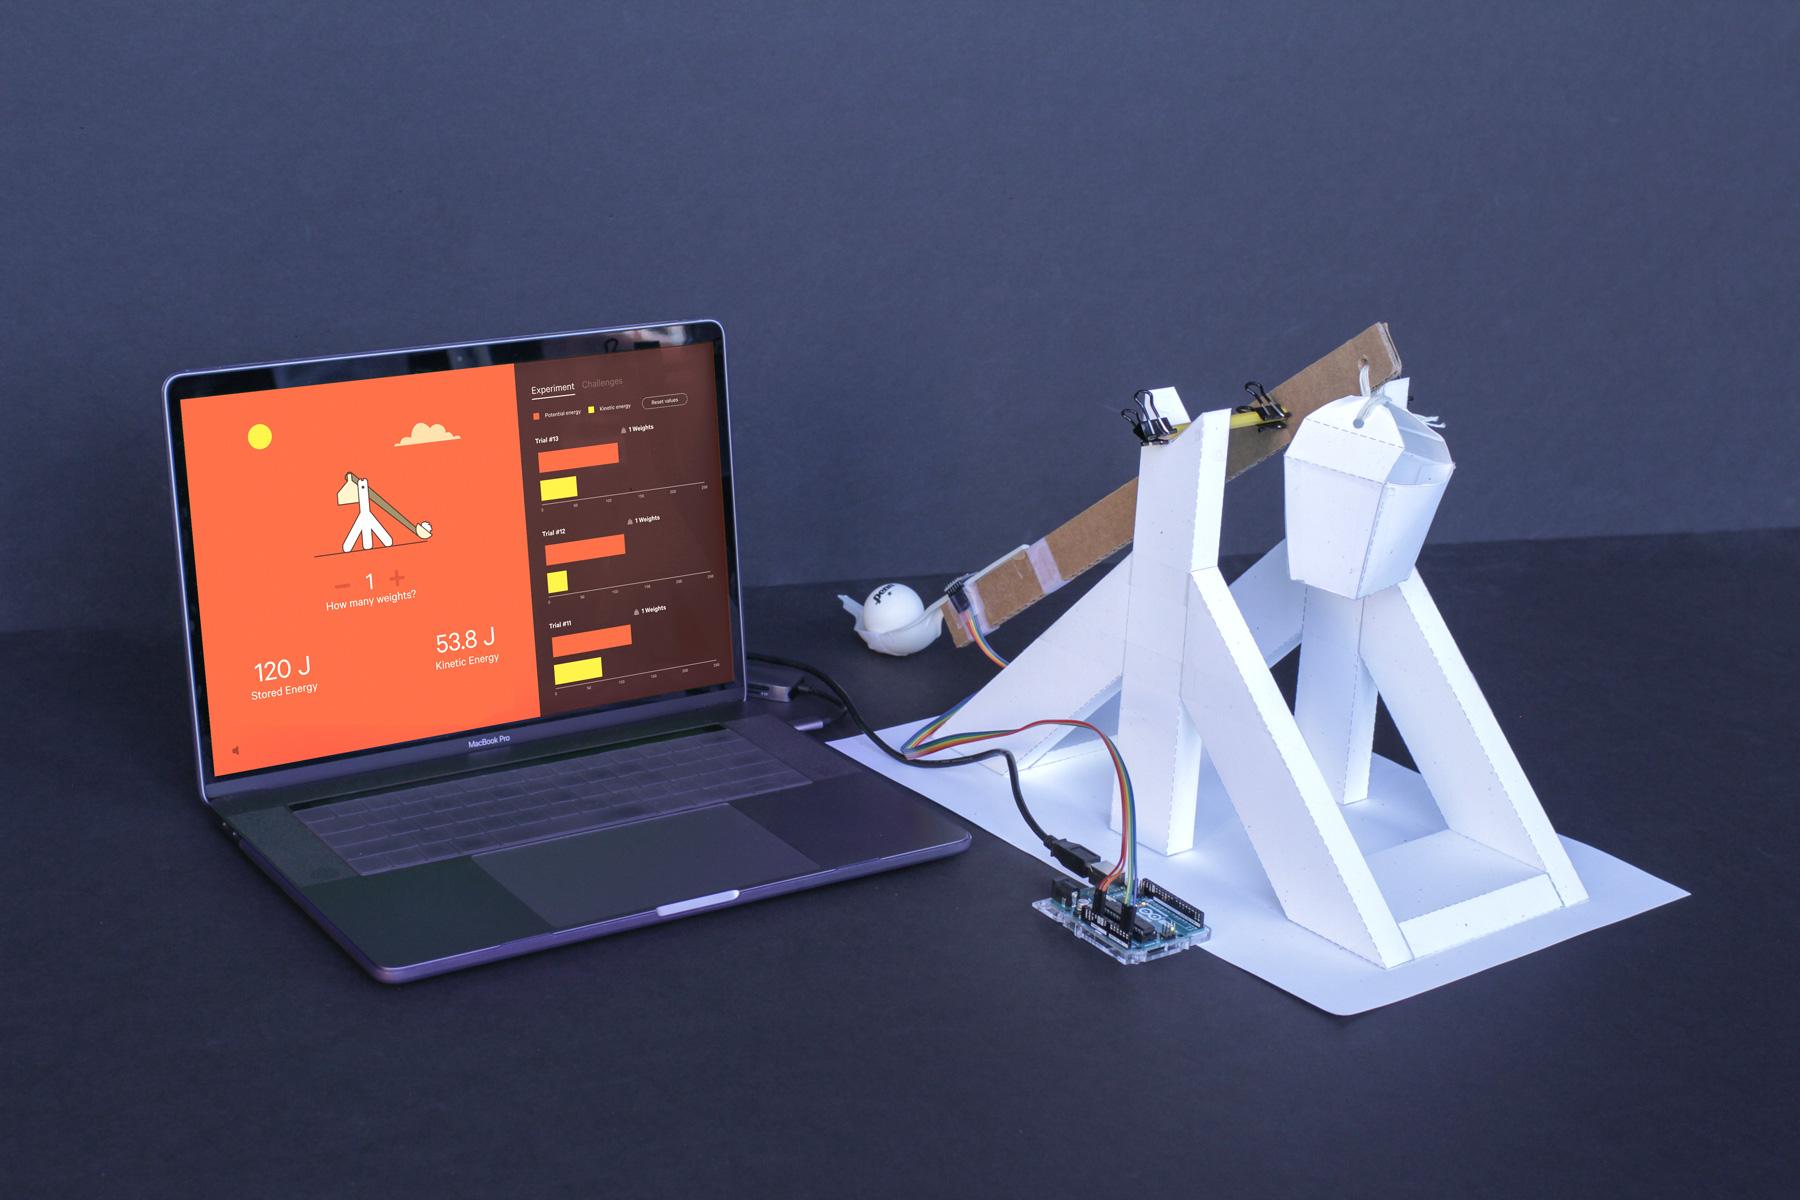 The trebuchet, Arduino setup, and digital interface